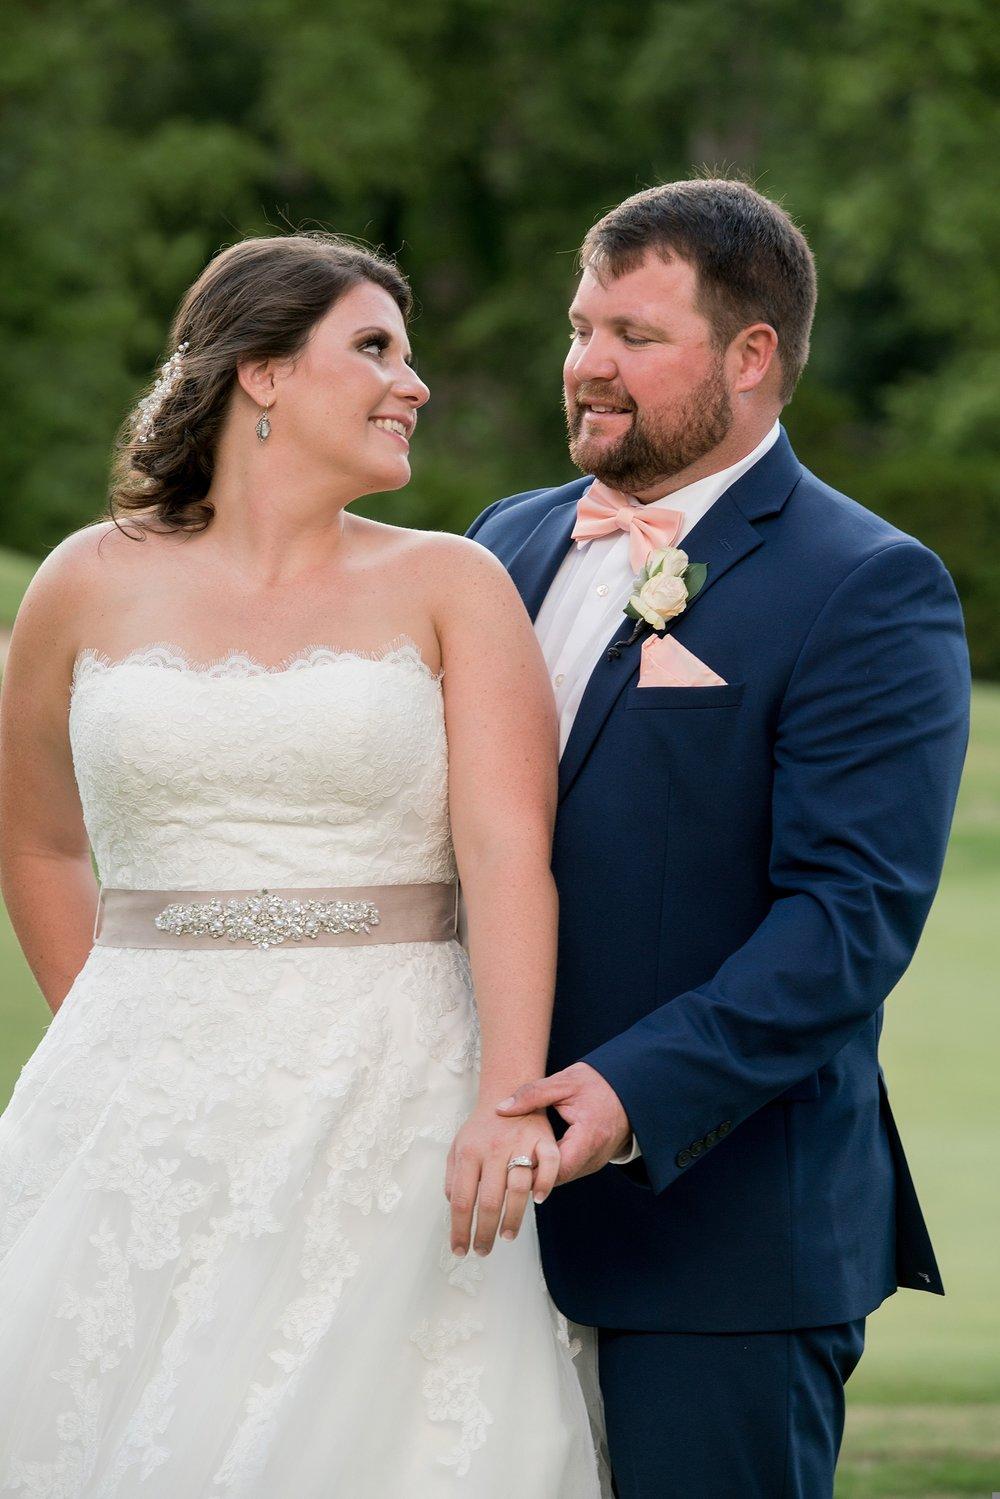 Prestonwood-Country-Club-Wedding-Photographer-171.jpg